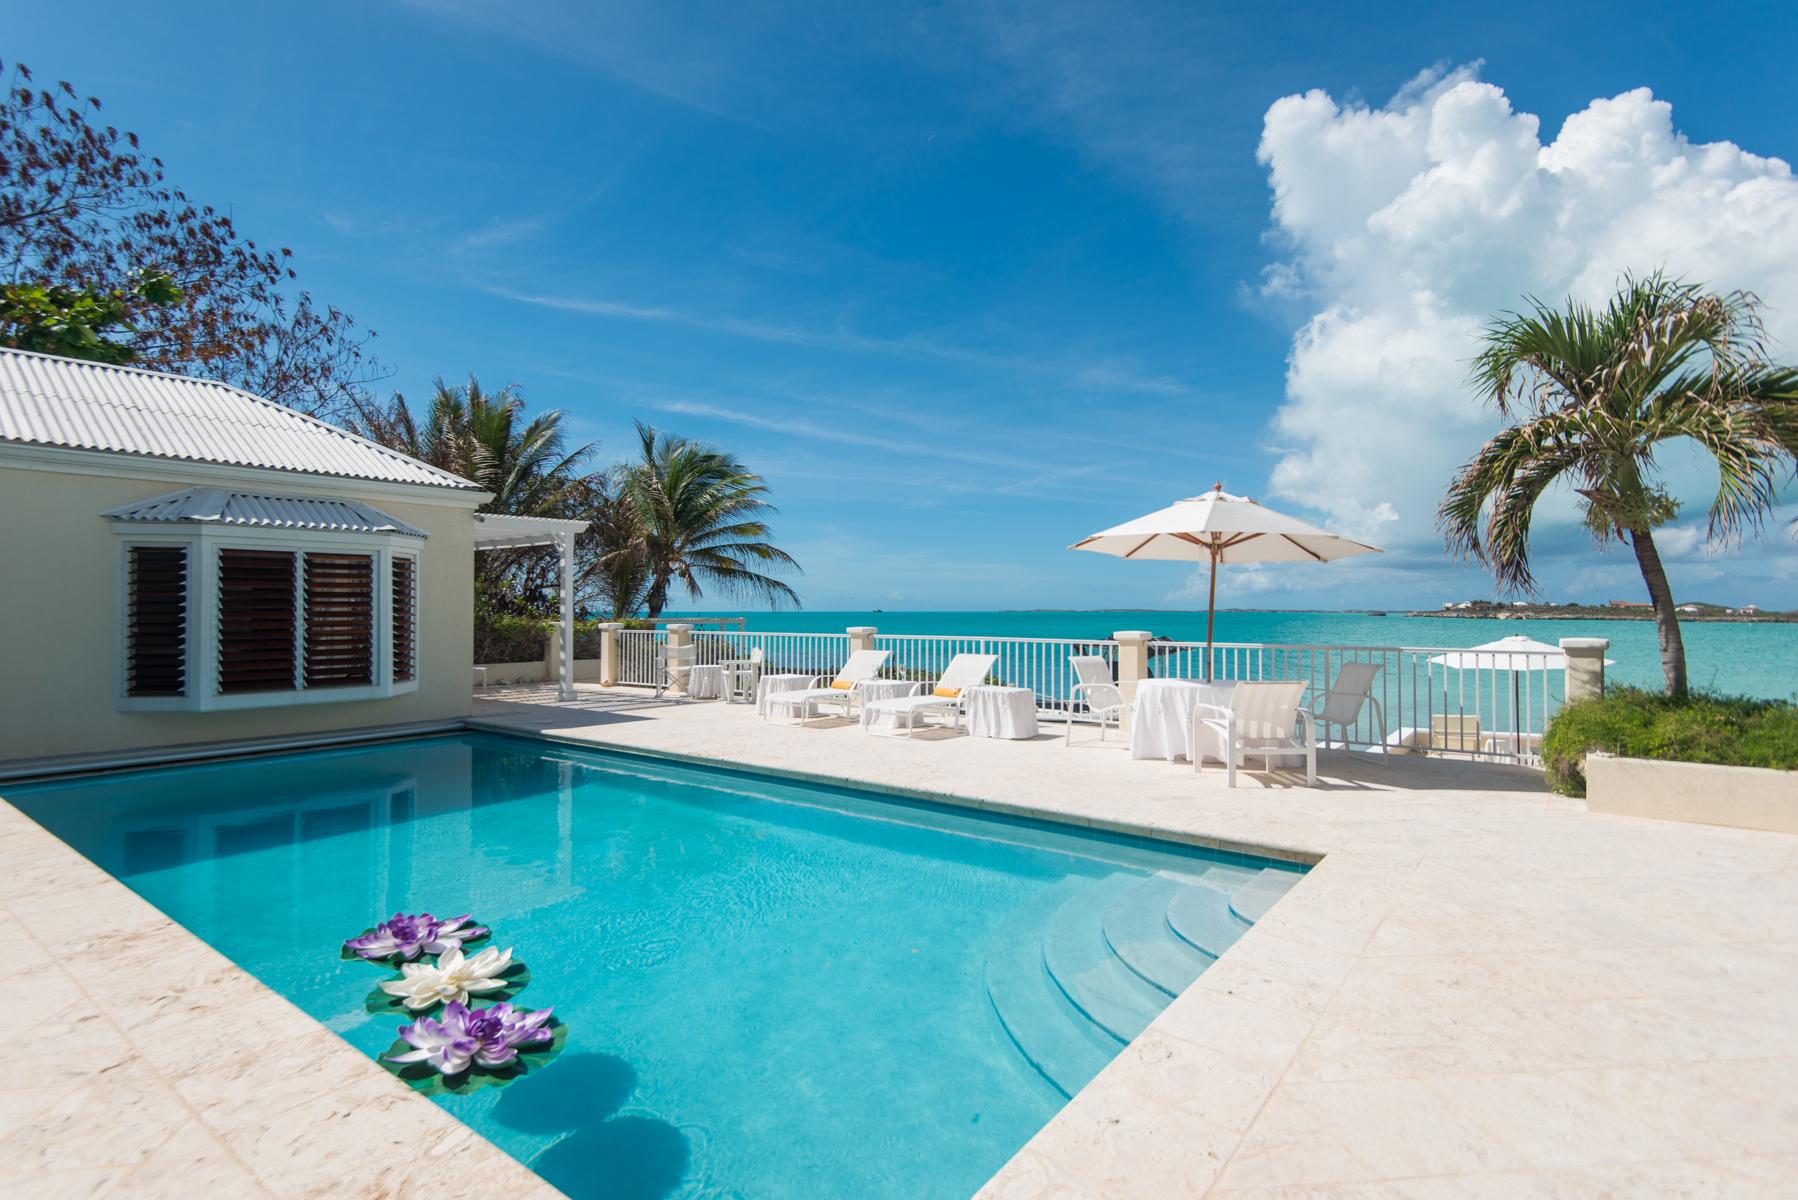 Moradia para Venda às Casa Ananas Beachfront Sapodilla Bay, Providenciales TCI Turks E Caicos